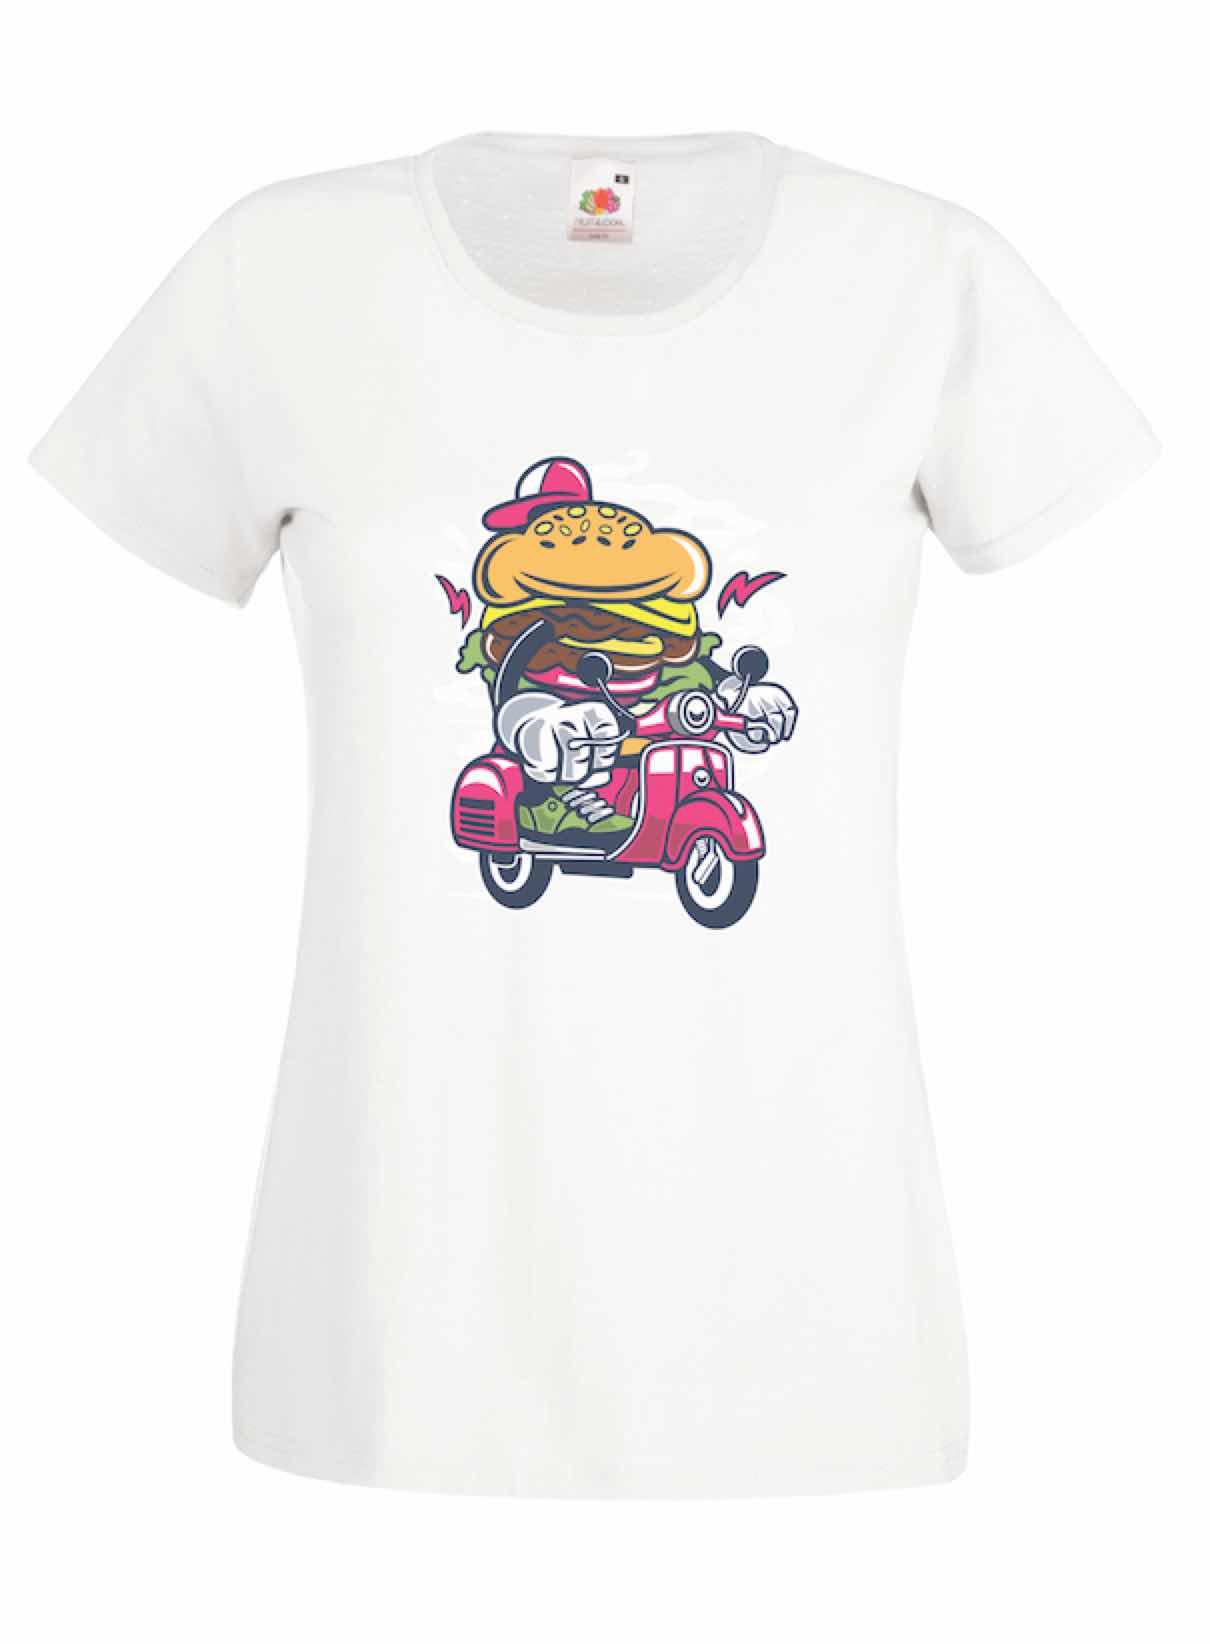 Burger Scooter design for t-shirt, hoodie & sweatshirt